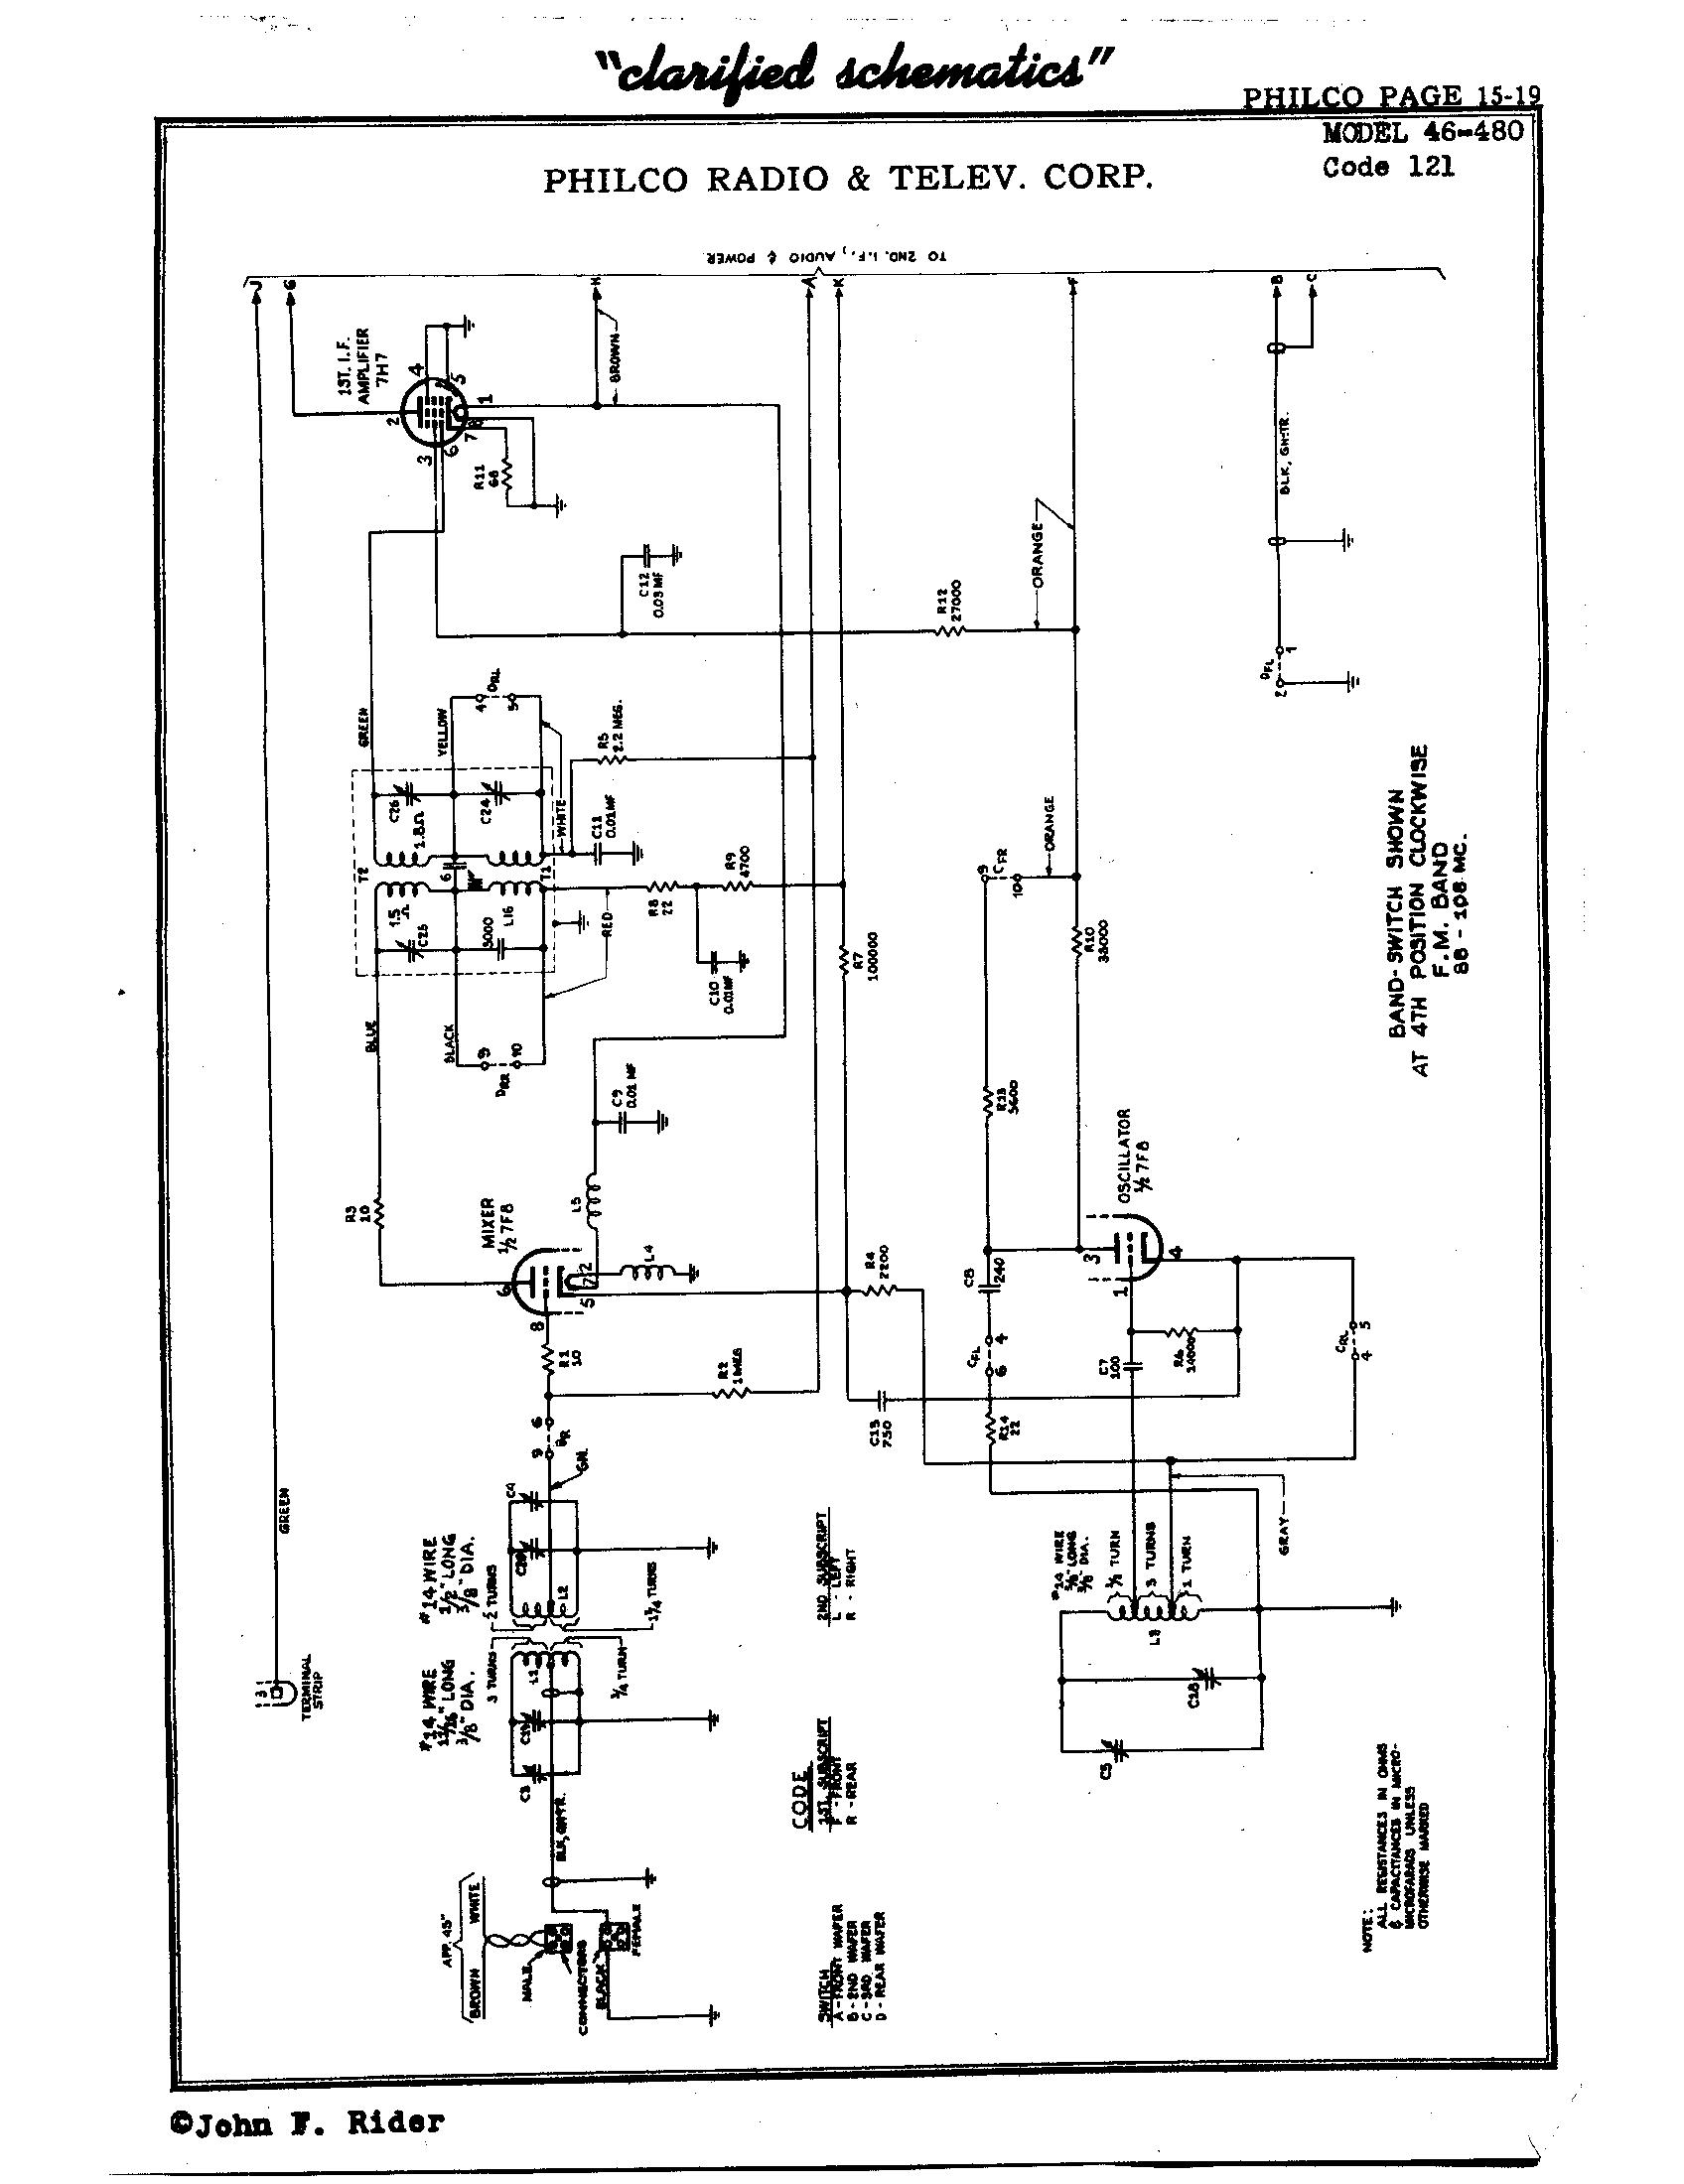 Edwards 24v Transformer Wiring Diagram Wire Data Schema Transformers 598 480 Power In 24vac 480v